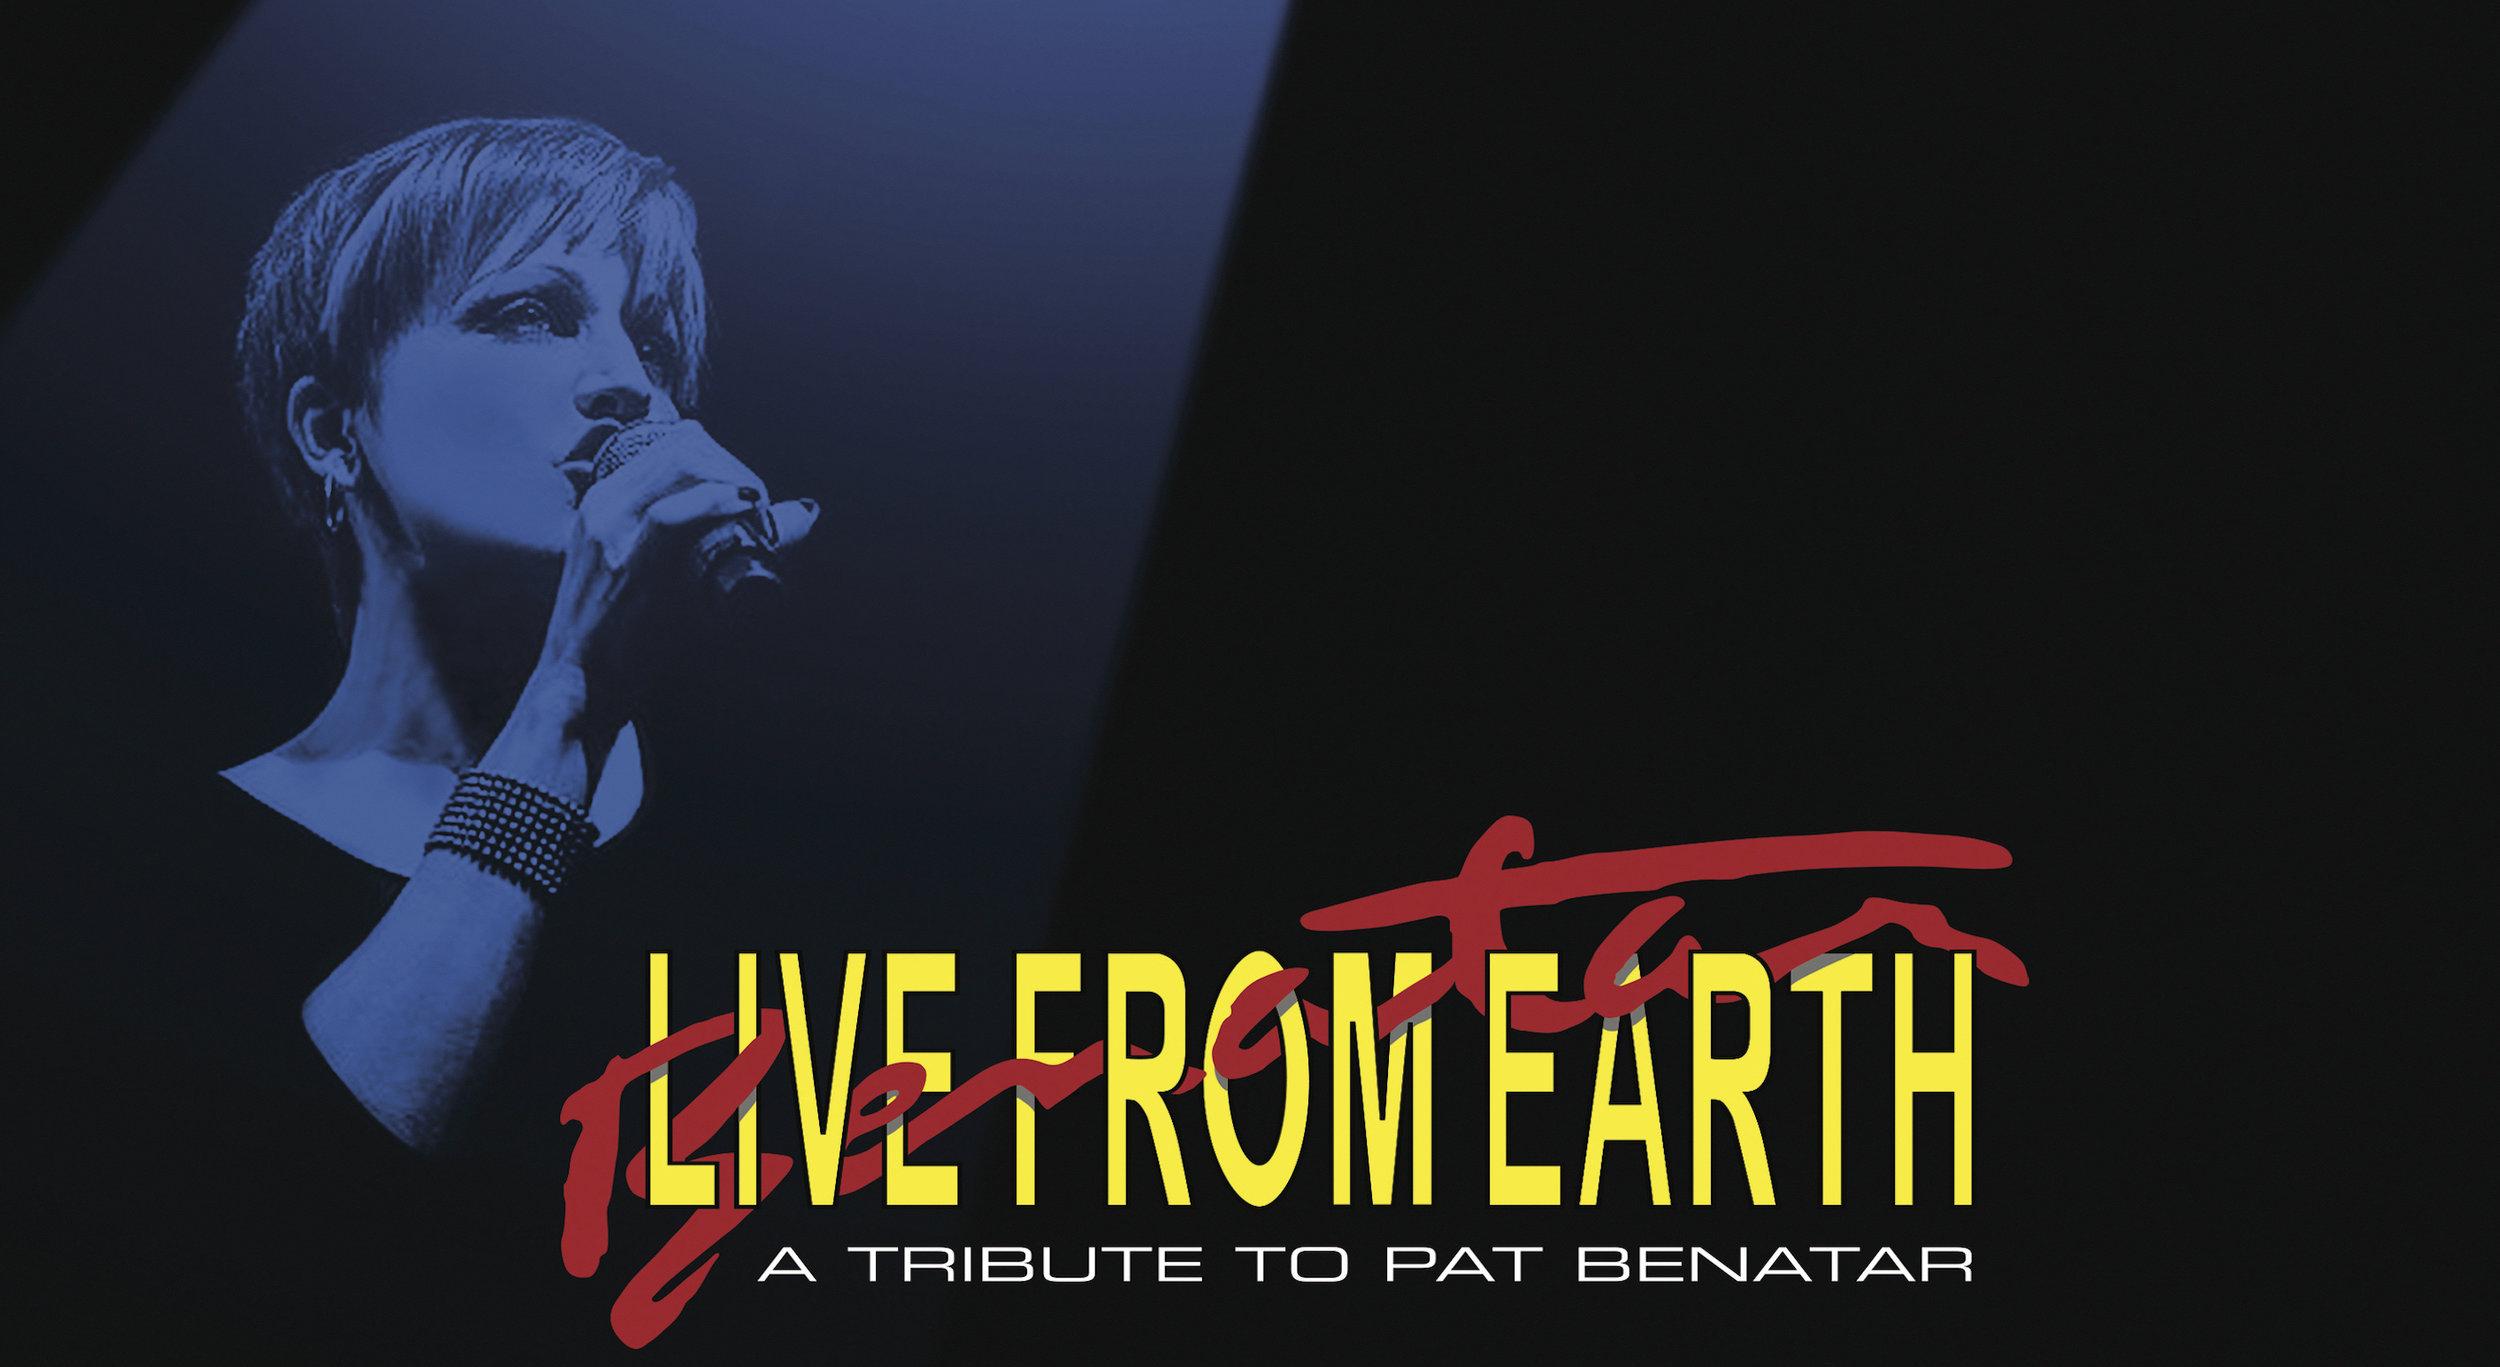 Pat Benatar Live From Earth